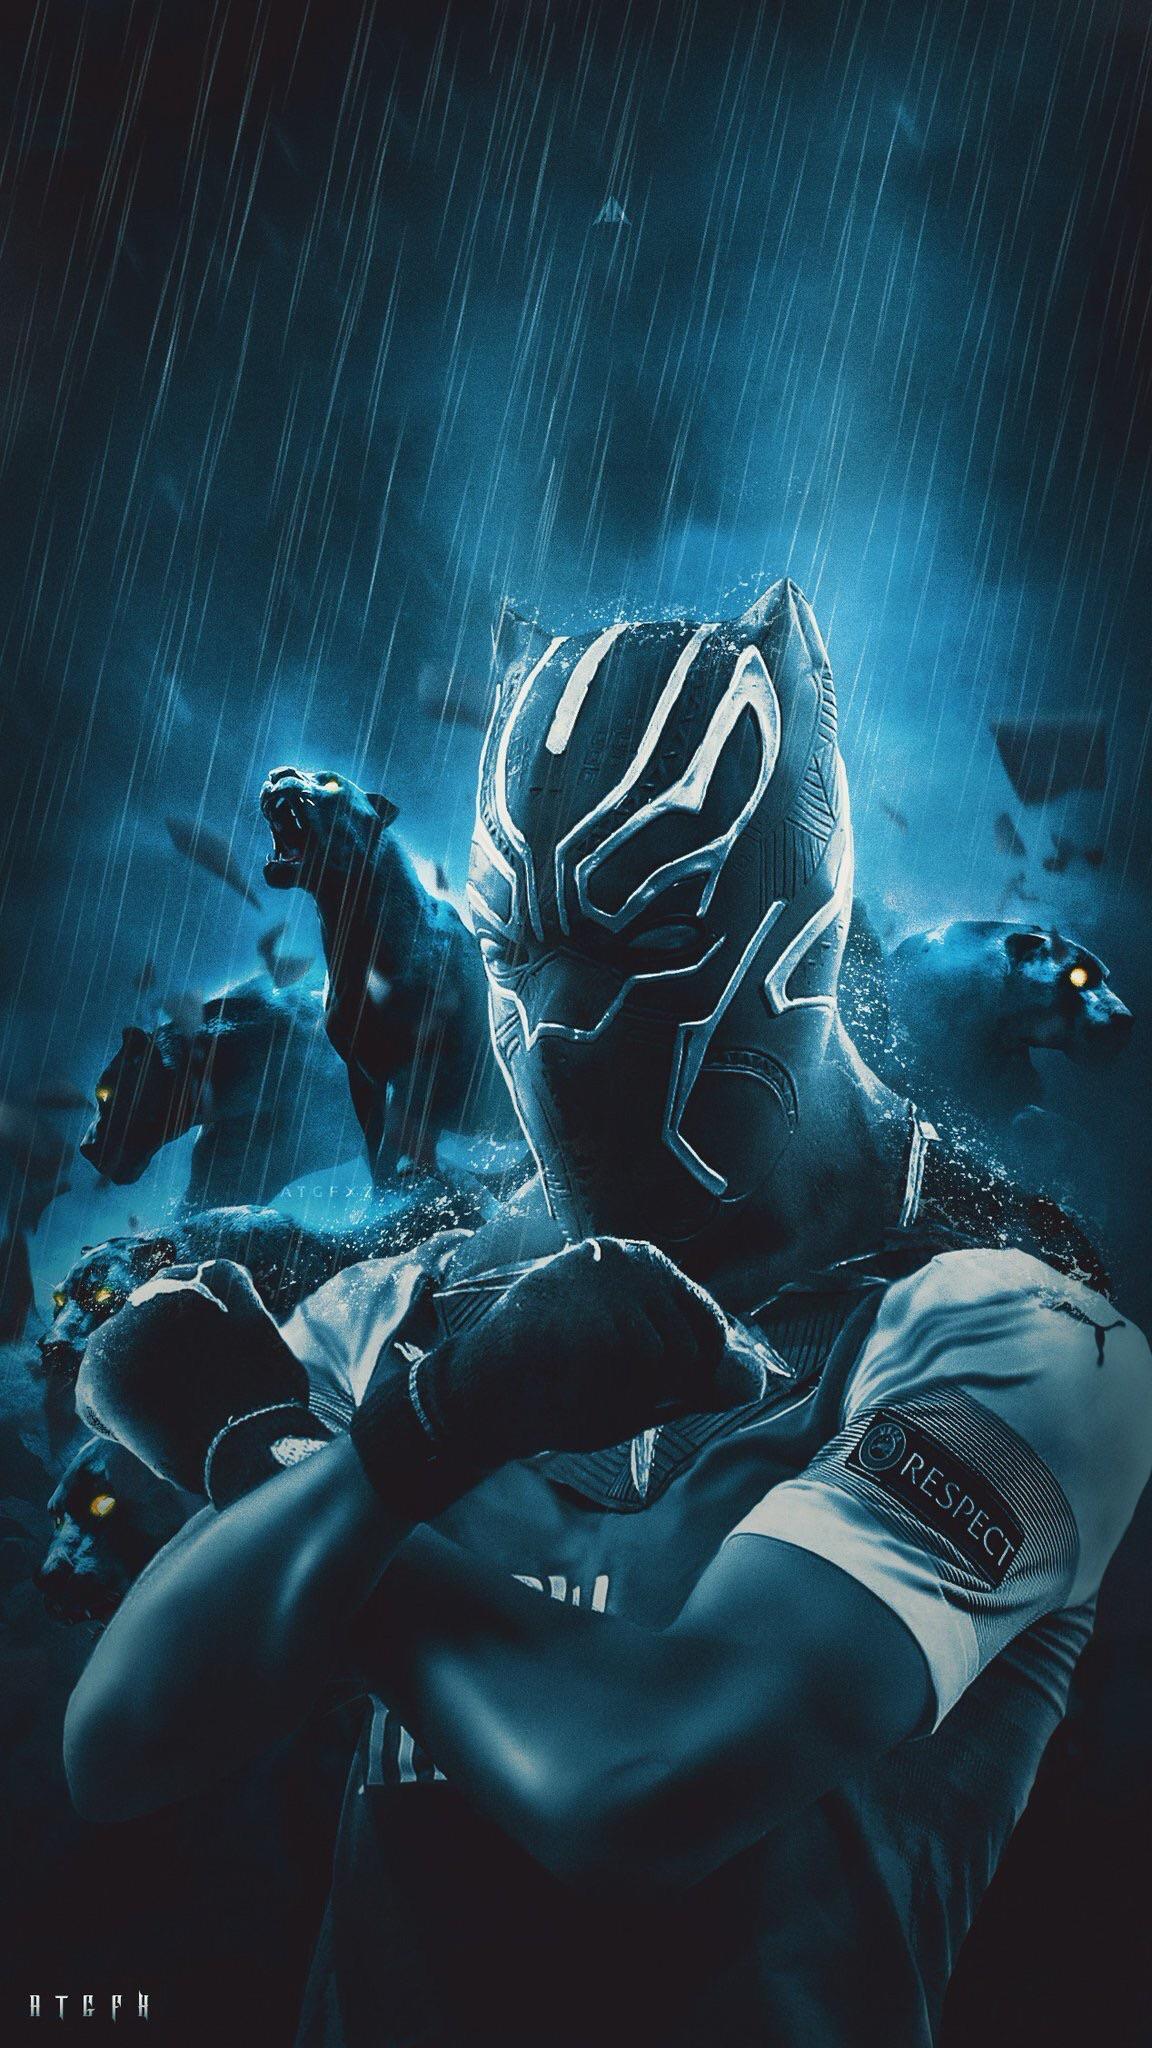 Black Panther Phone Wallpapers Top Free Black Panther